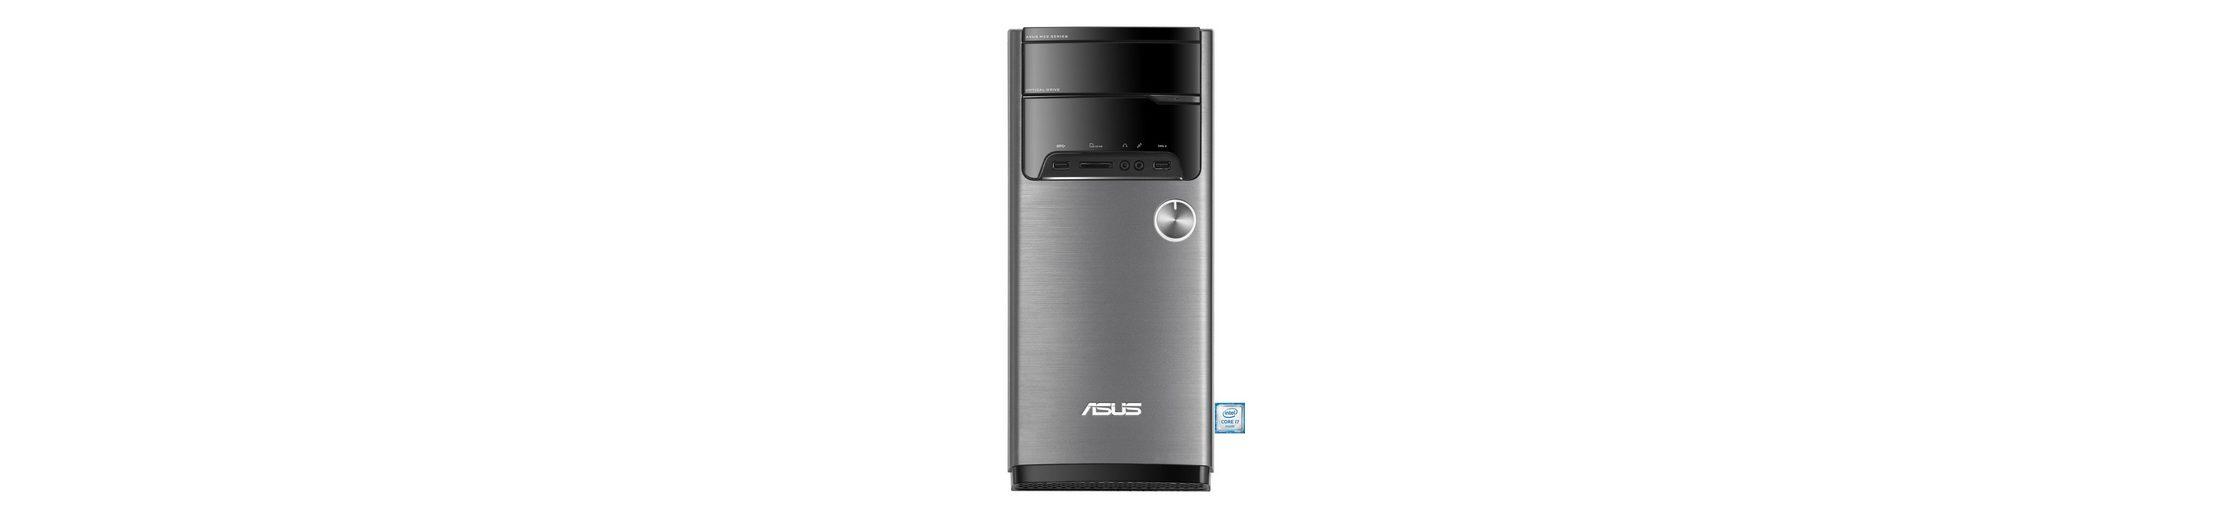 ASUS M32CD-DE013T Desktop PC »Intel Core i7, AMD R9 380, 1TB + 128GB SSD, 8GB«